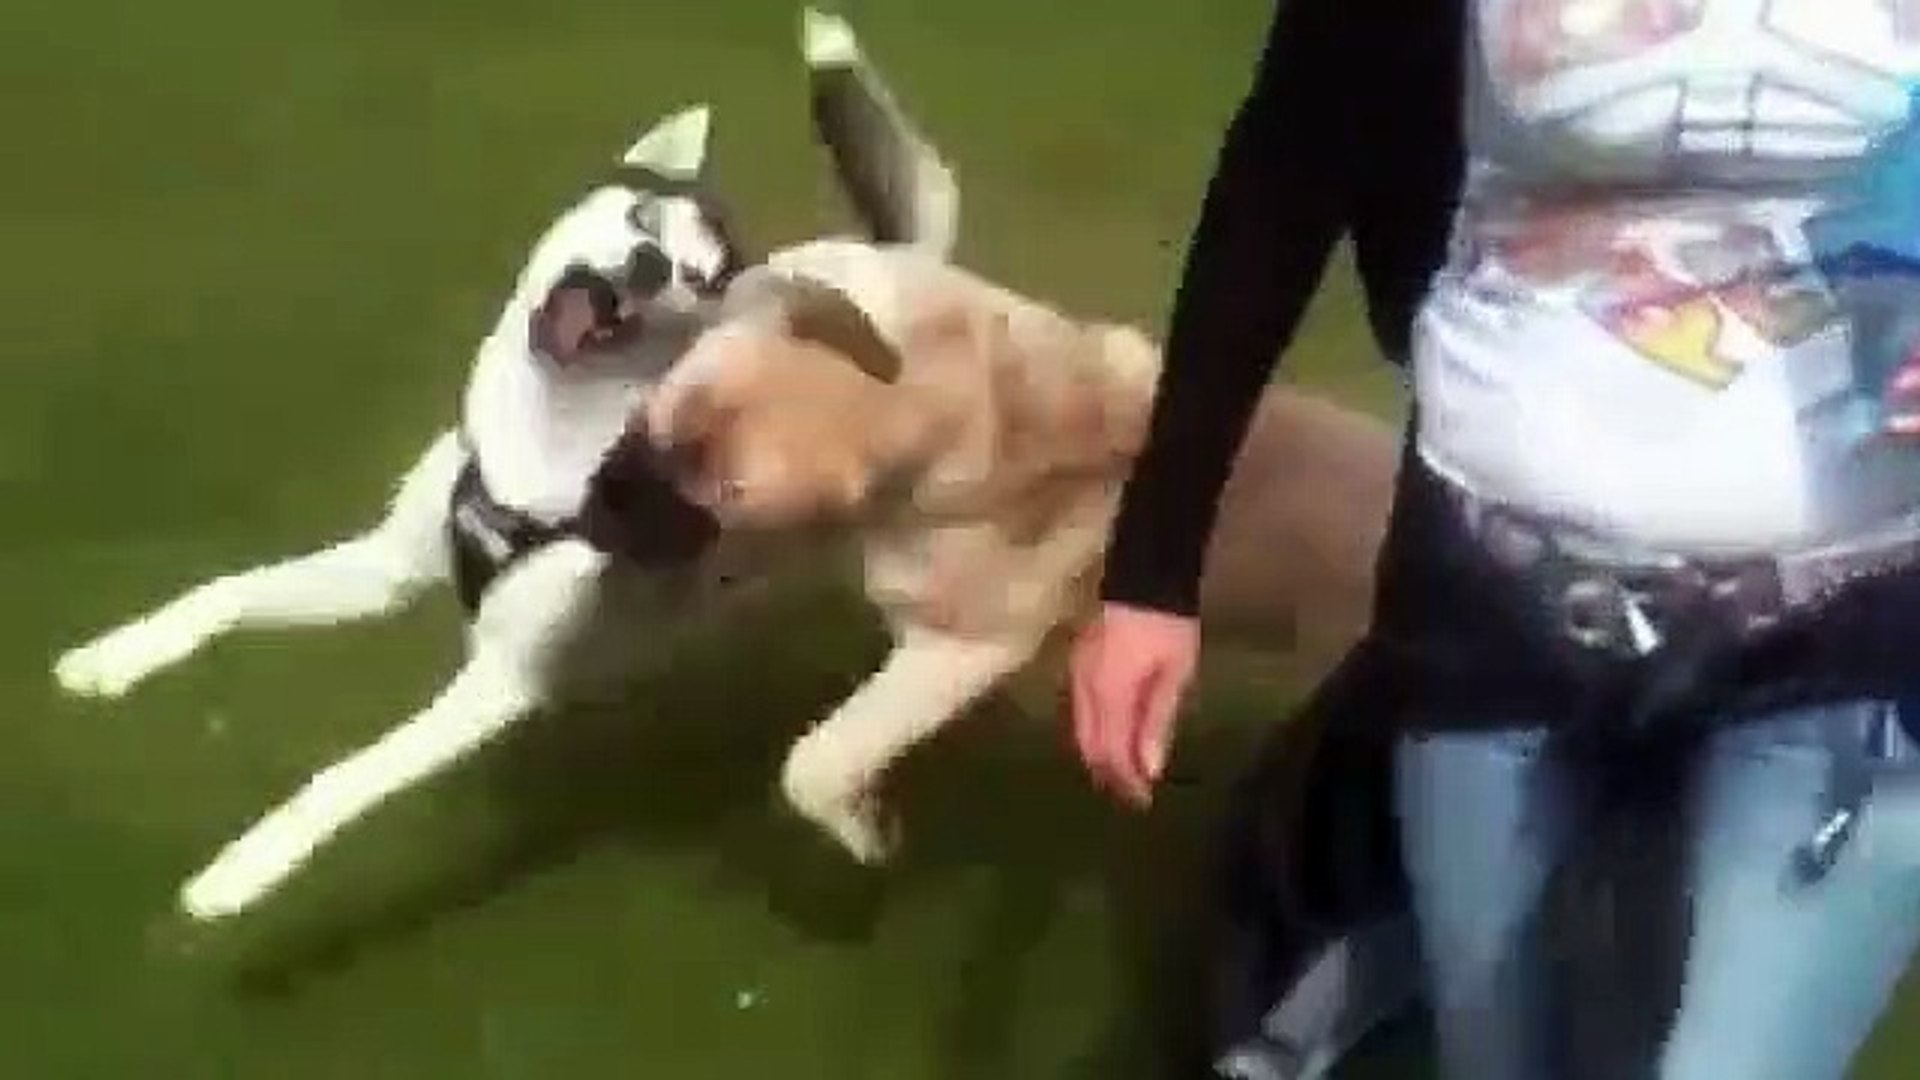 SiBiRYA KURDU vs ANADOLU COBAN KOPEGi - SiBiRiAN HUSKY vs ANATOLiAN SHEPHERD DOG